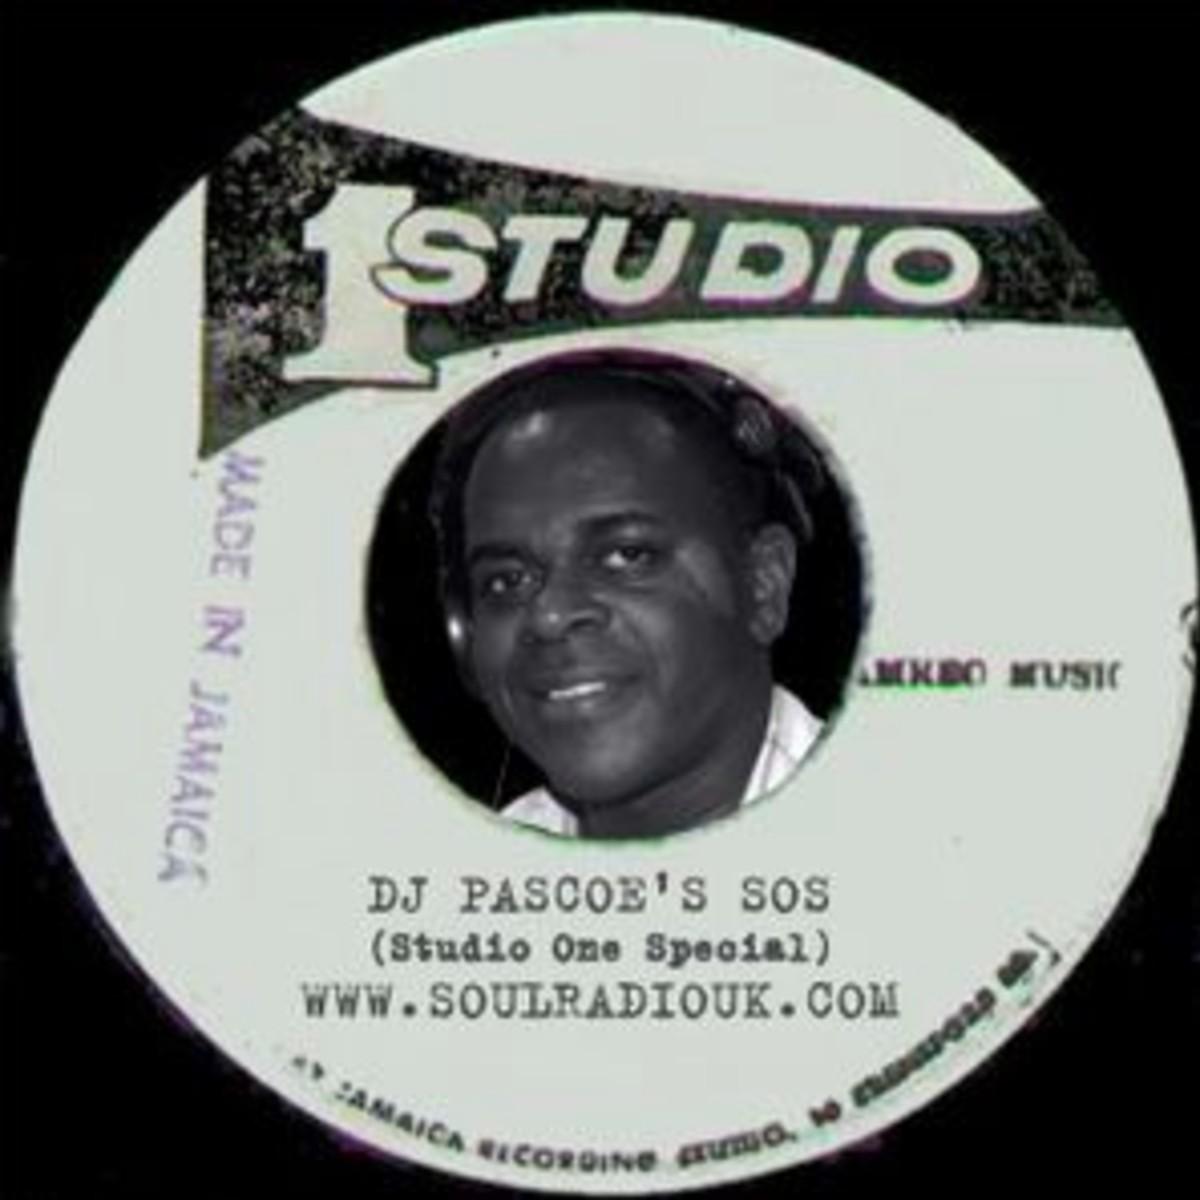 DJ Pascoe's Studio One Special